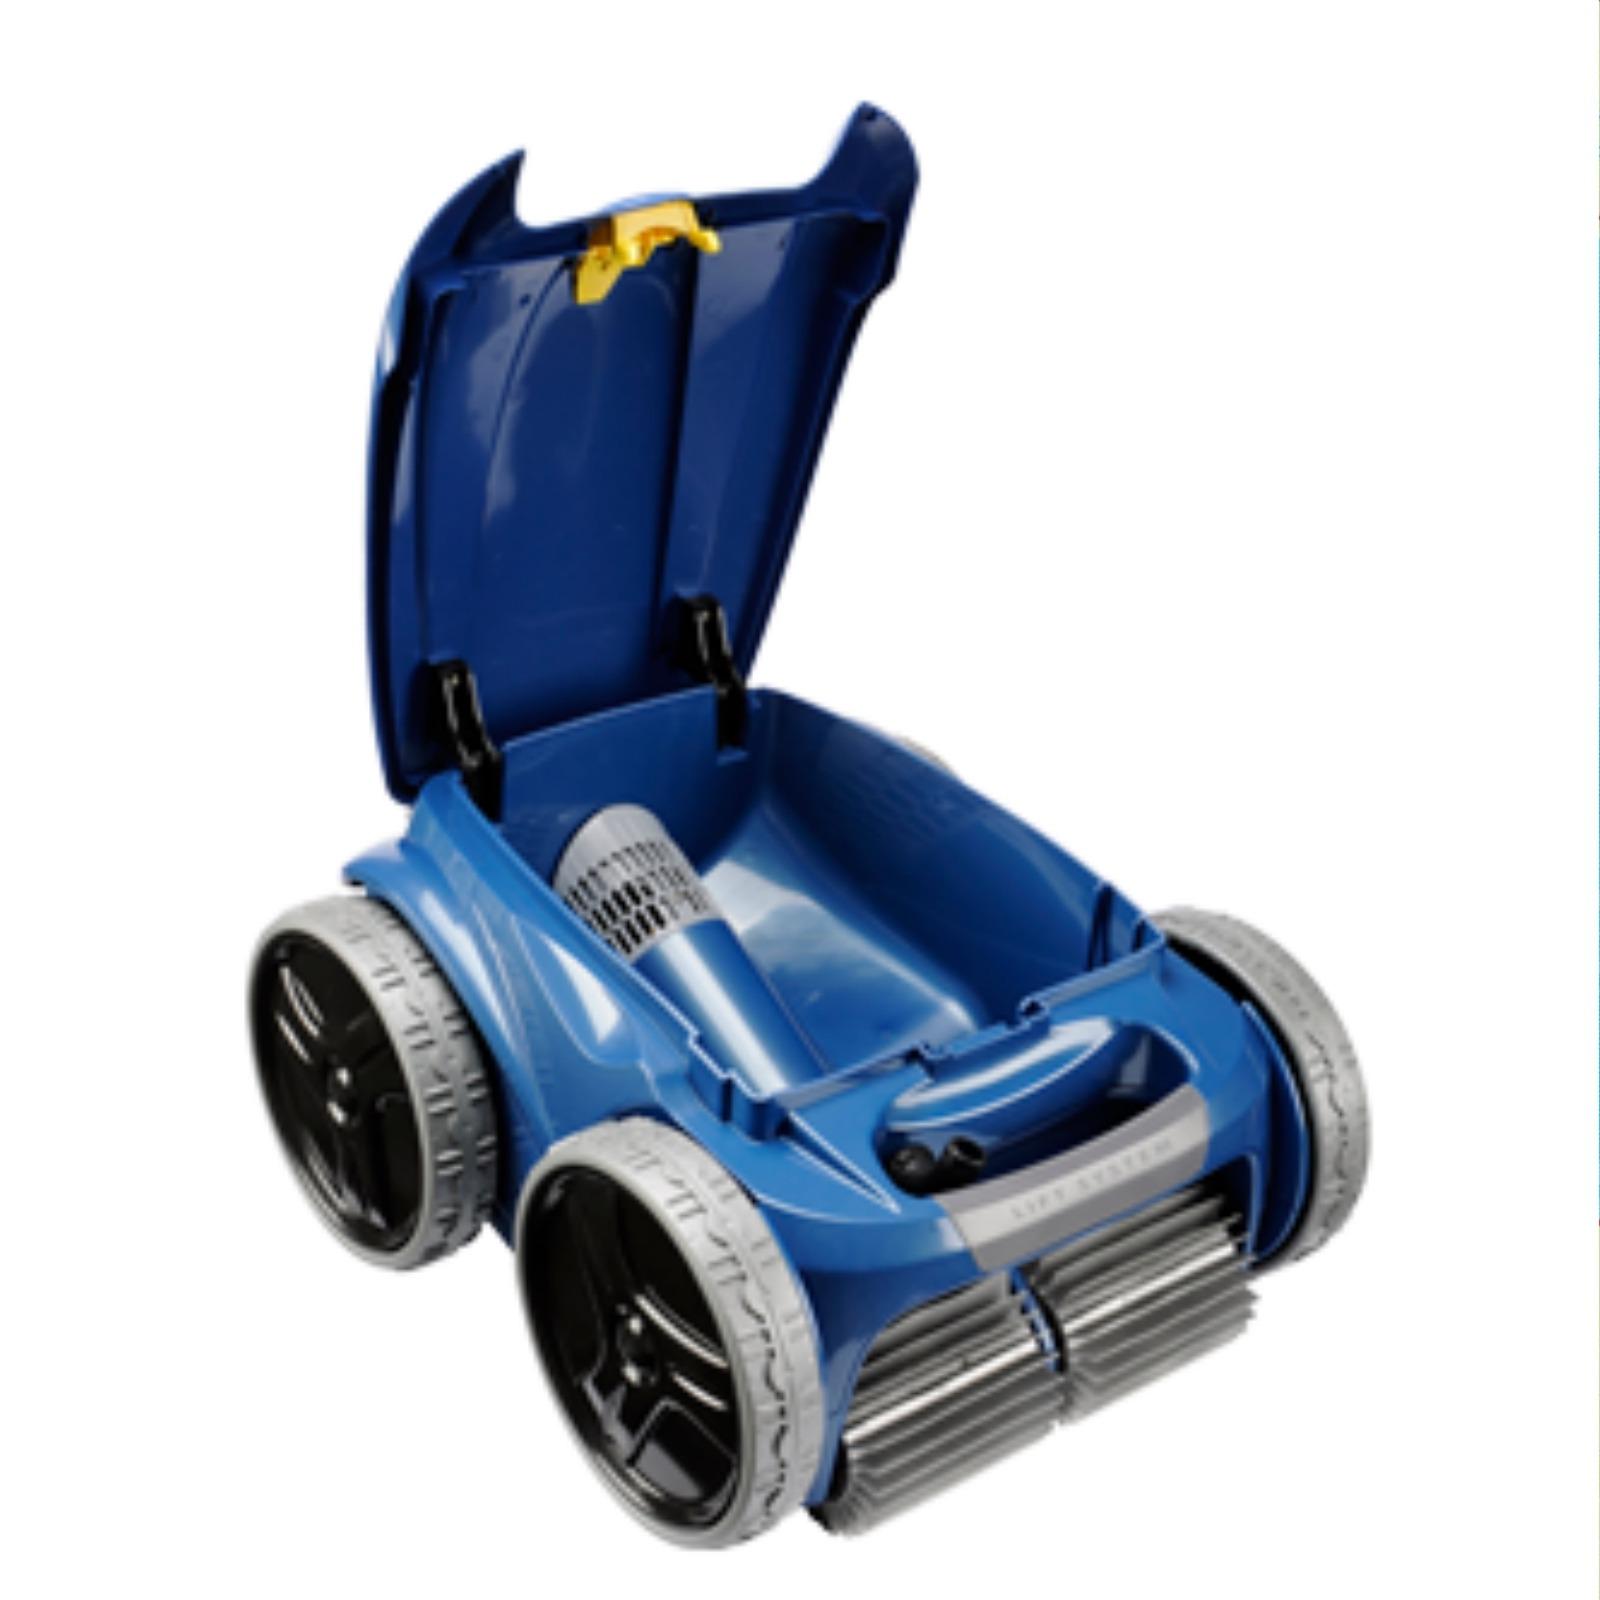 Best 28 qoqa ch zodiac rv 5500 robot zodiac rv 5500 for Aspirateur piscine zodiac vortex 3 4wd